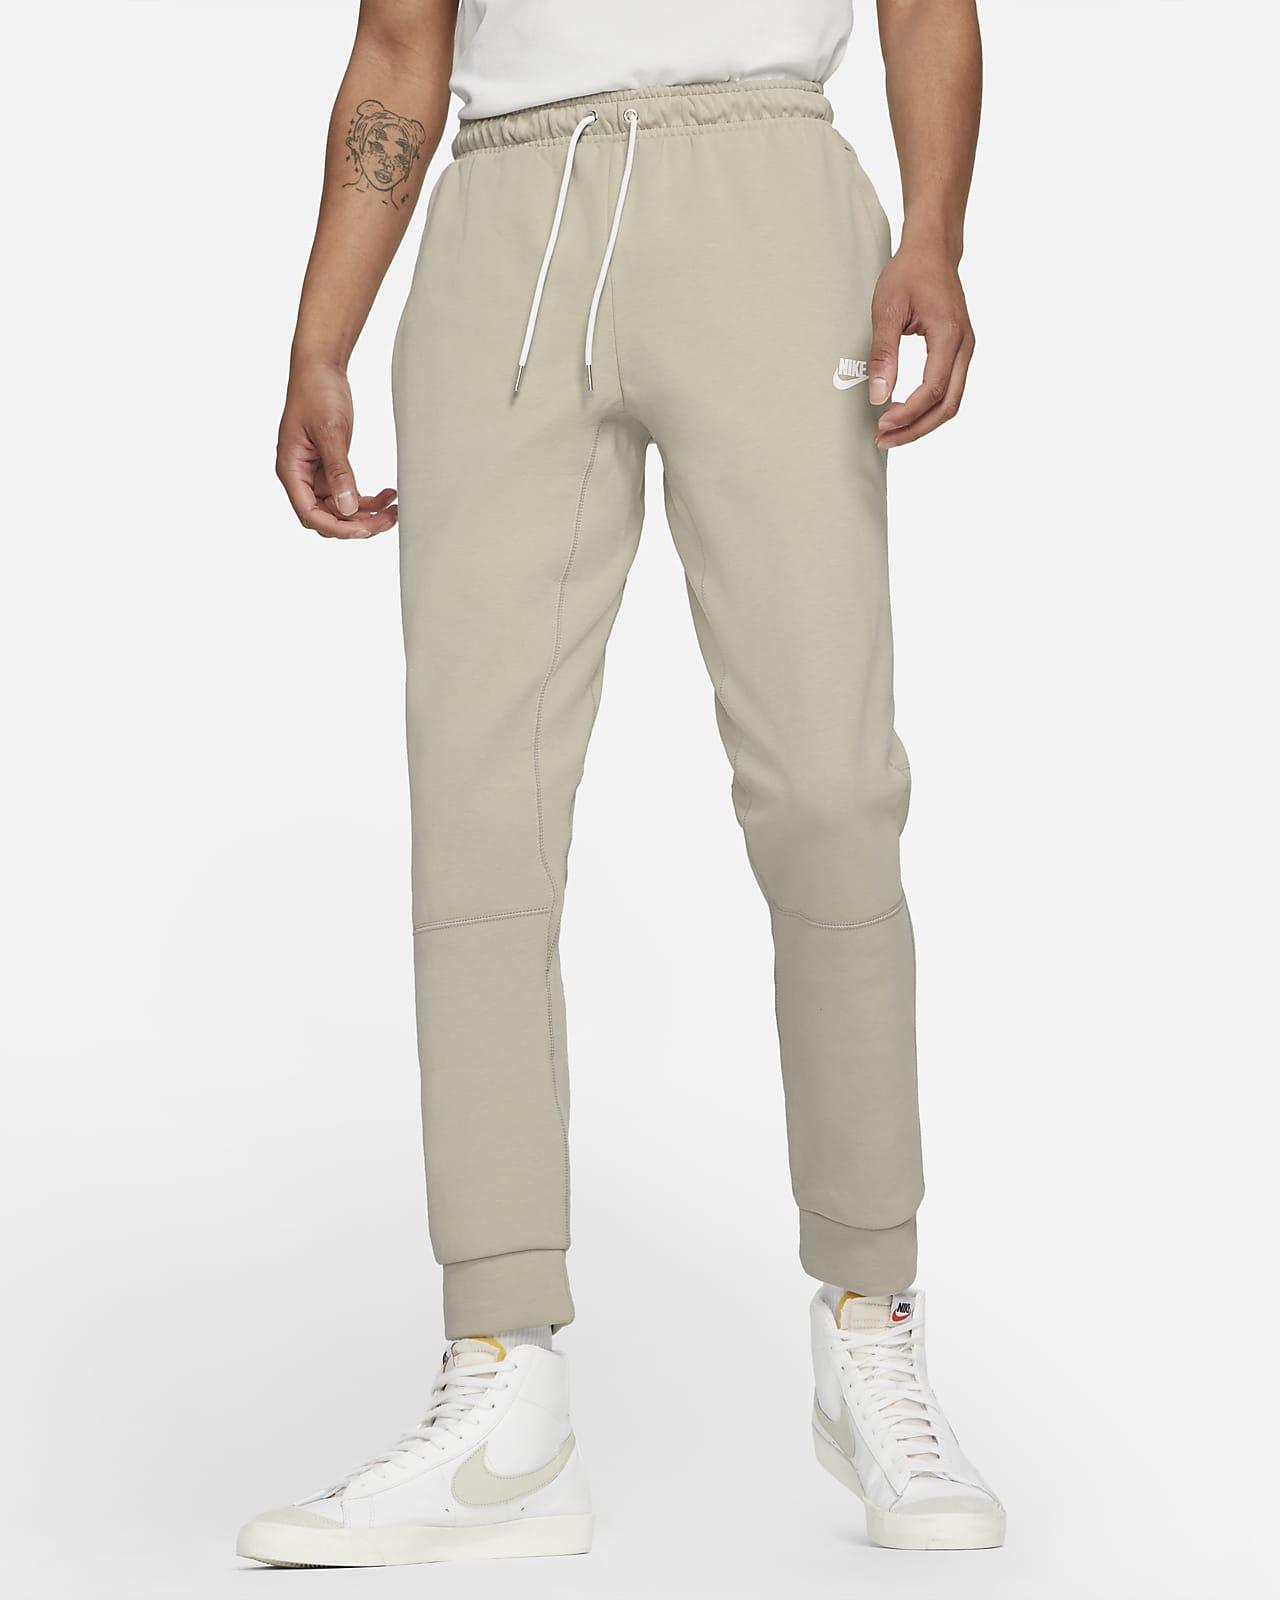 Nike Sportswear moderne Jogger für Herren